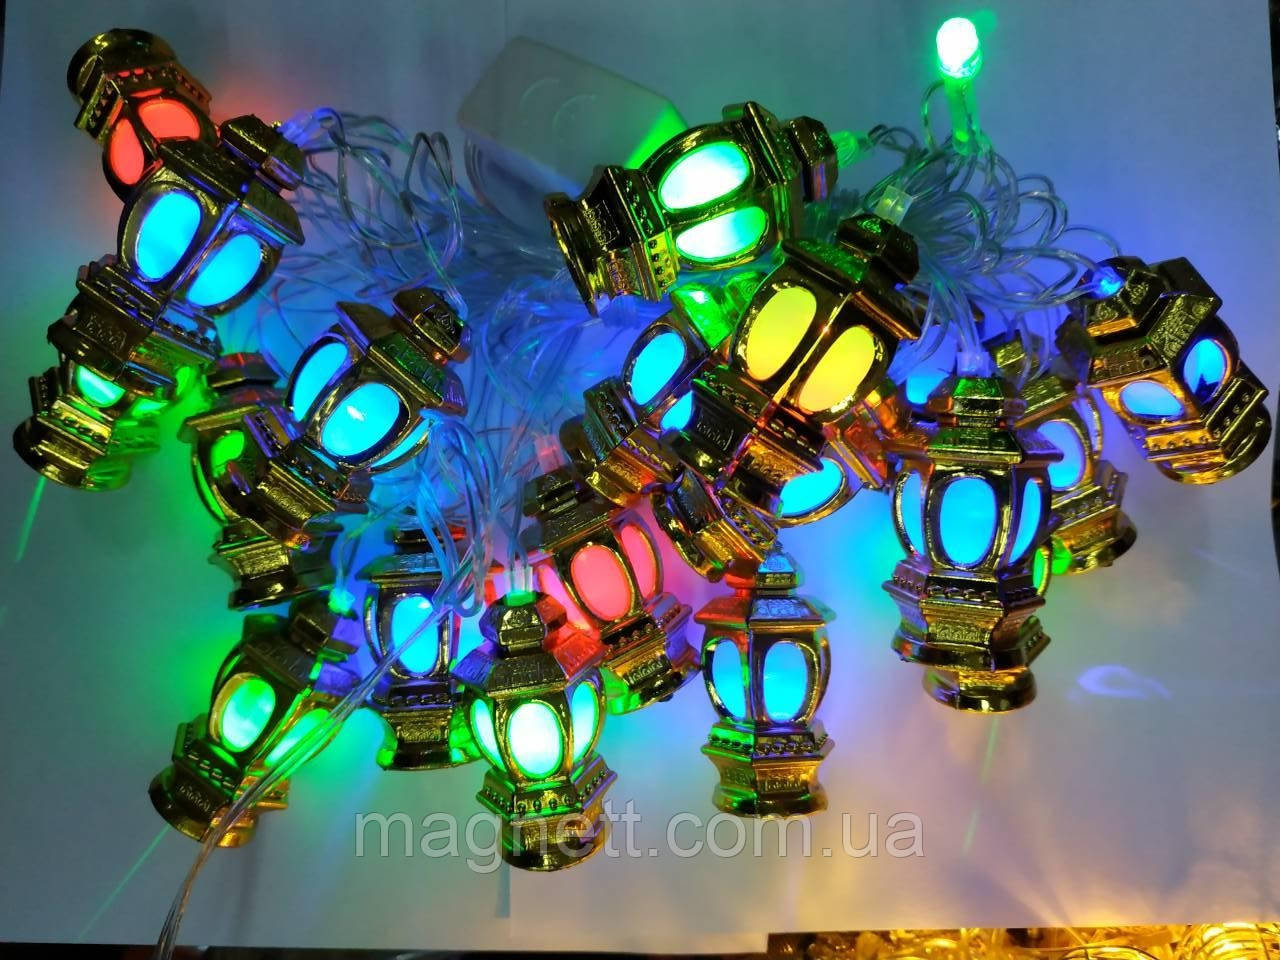 Оригинальная гирлянда фонарики 5 метров LED 20 (средние)